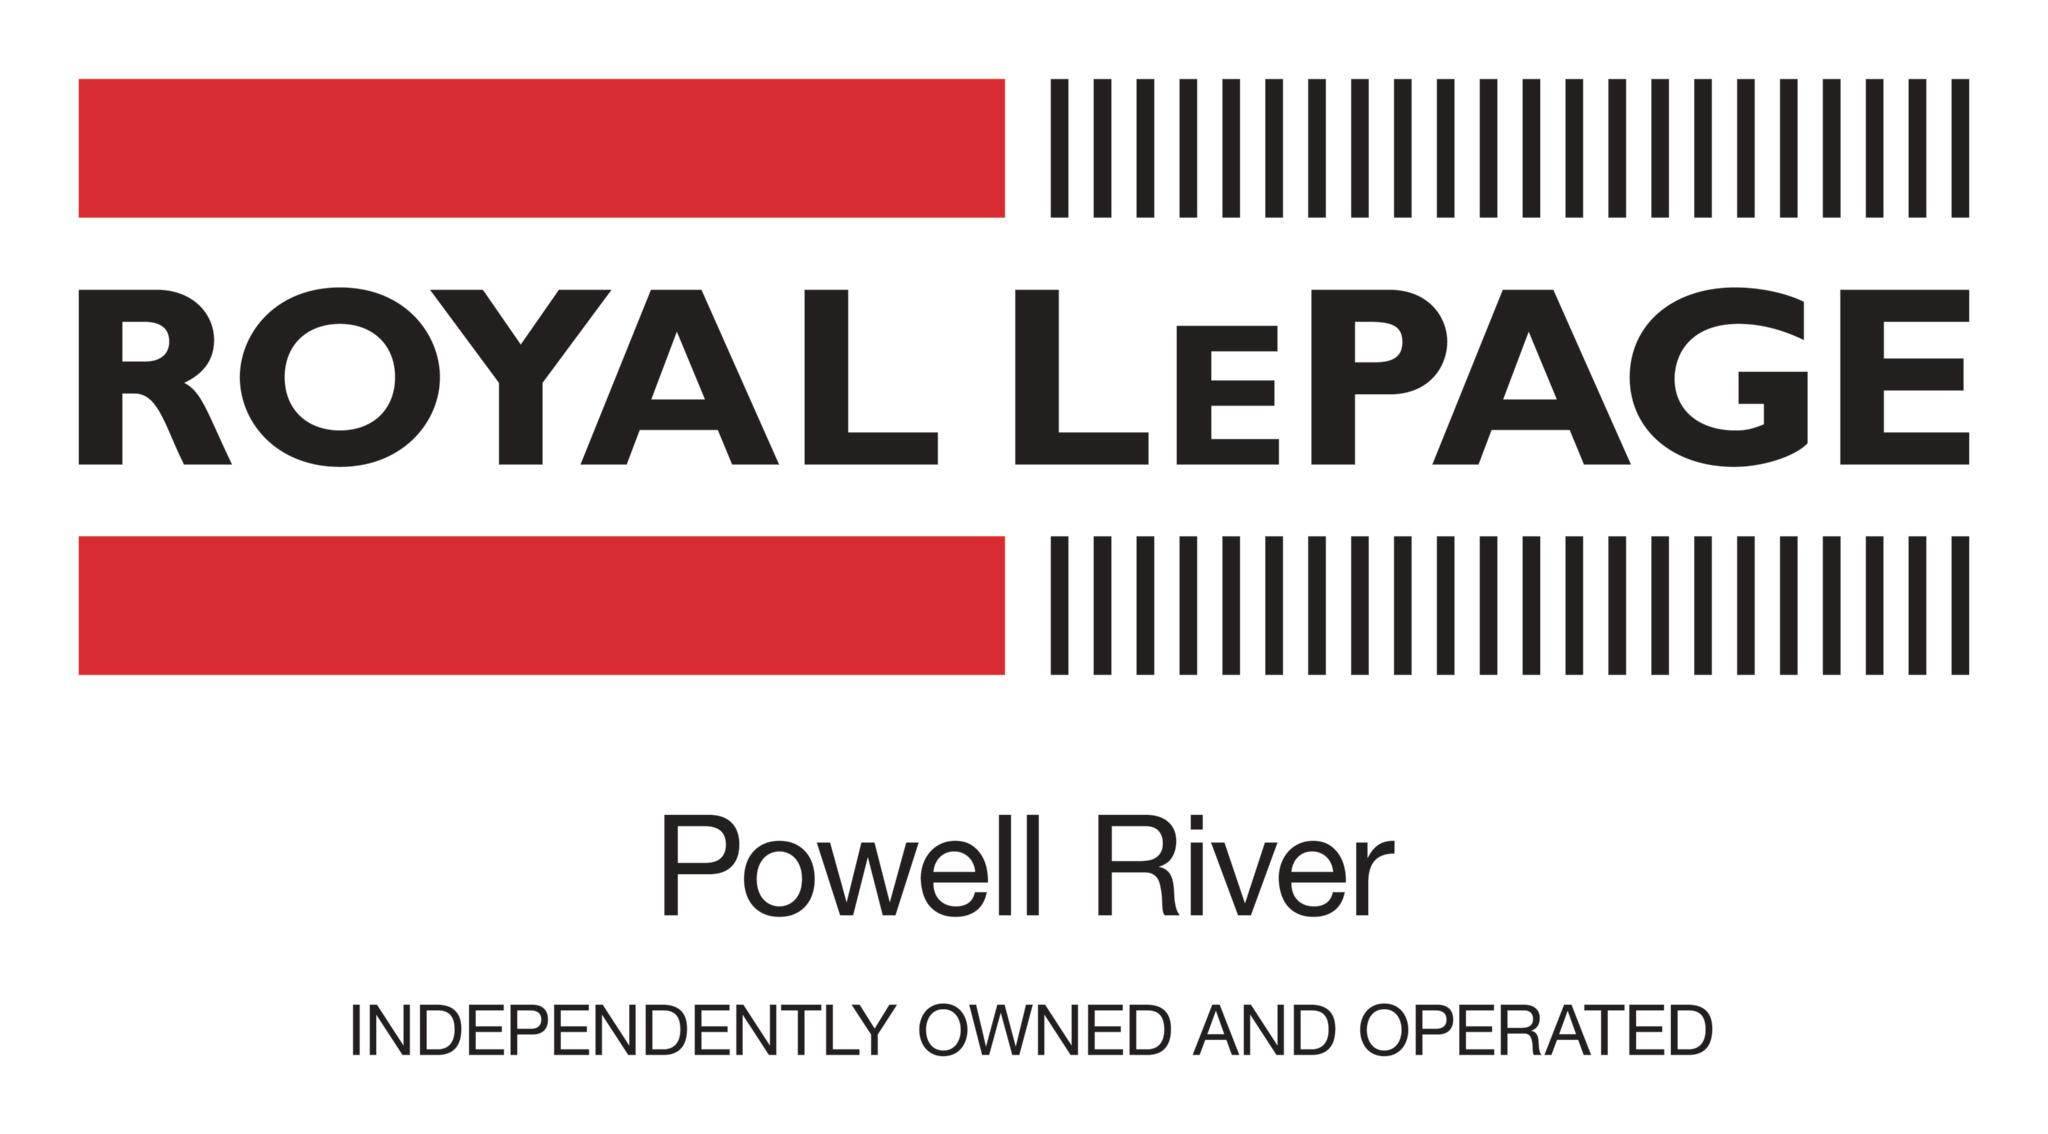 Royal LePage Powell River - Powell River, BC V8A 3B6 - (604)485-4231   ShowMeLocal.com